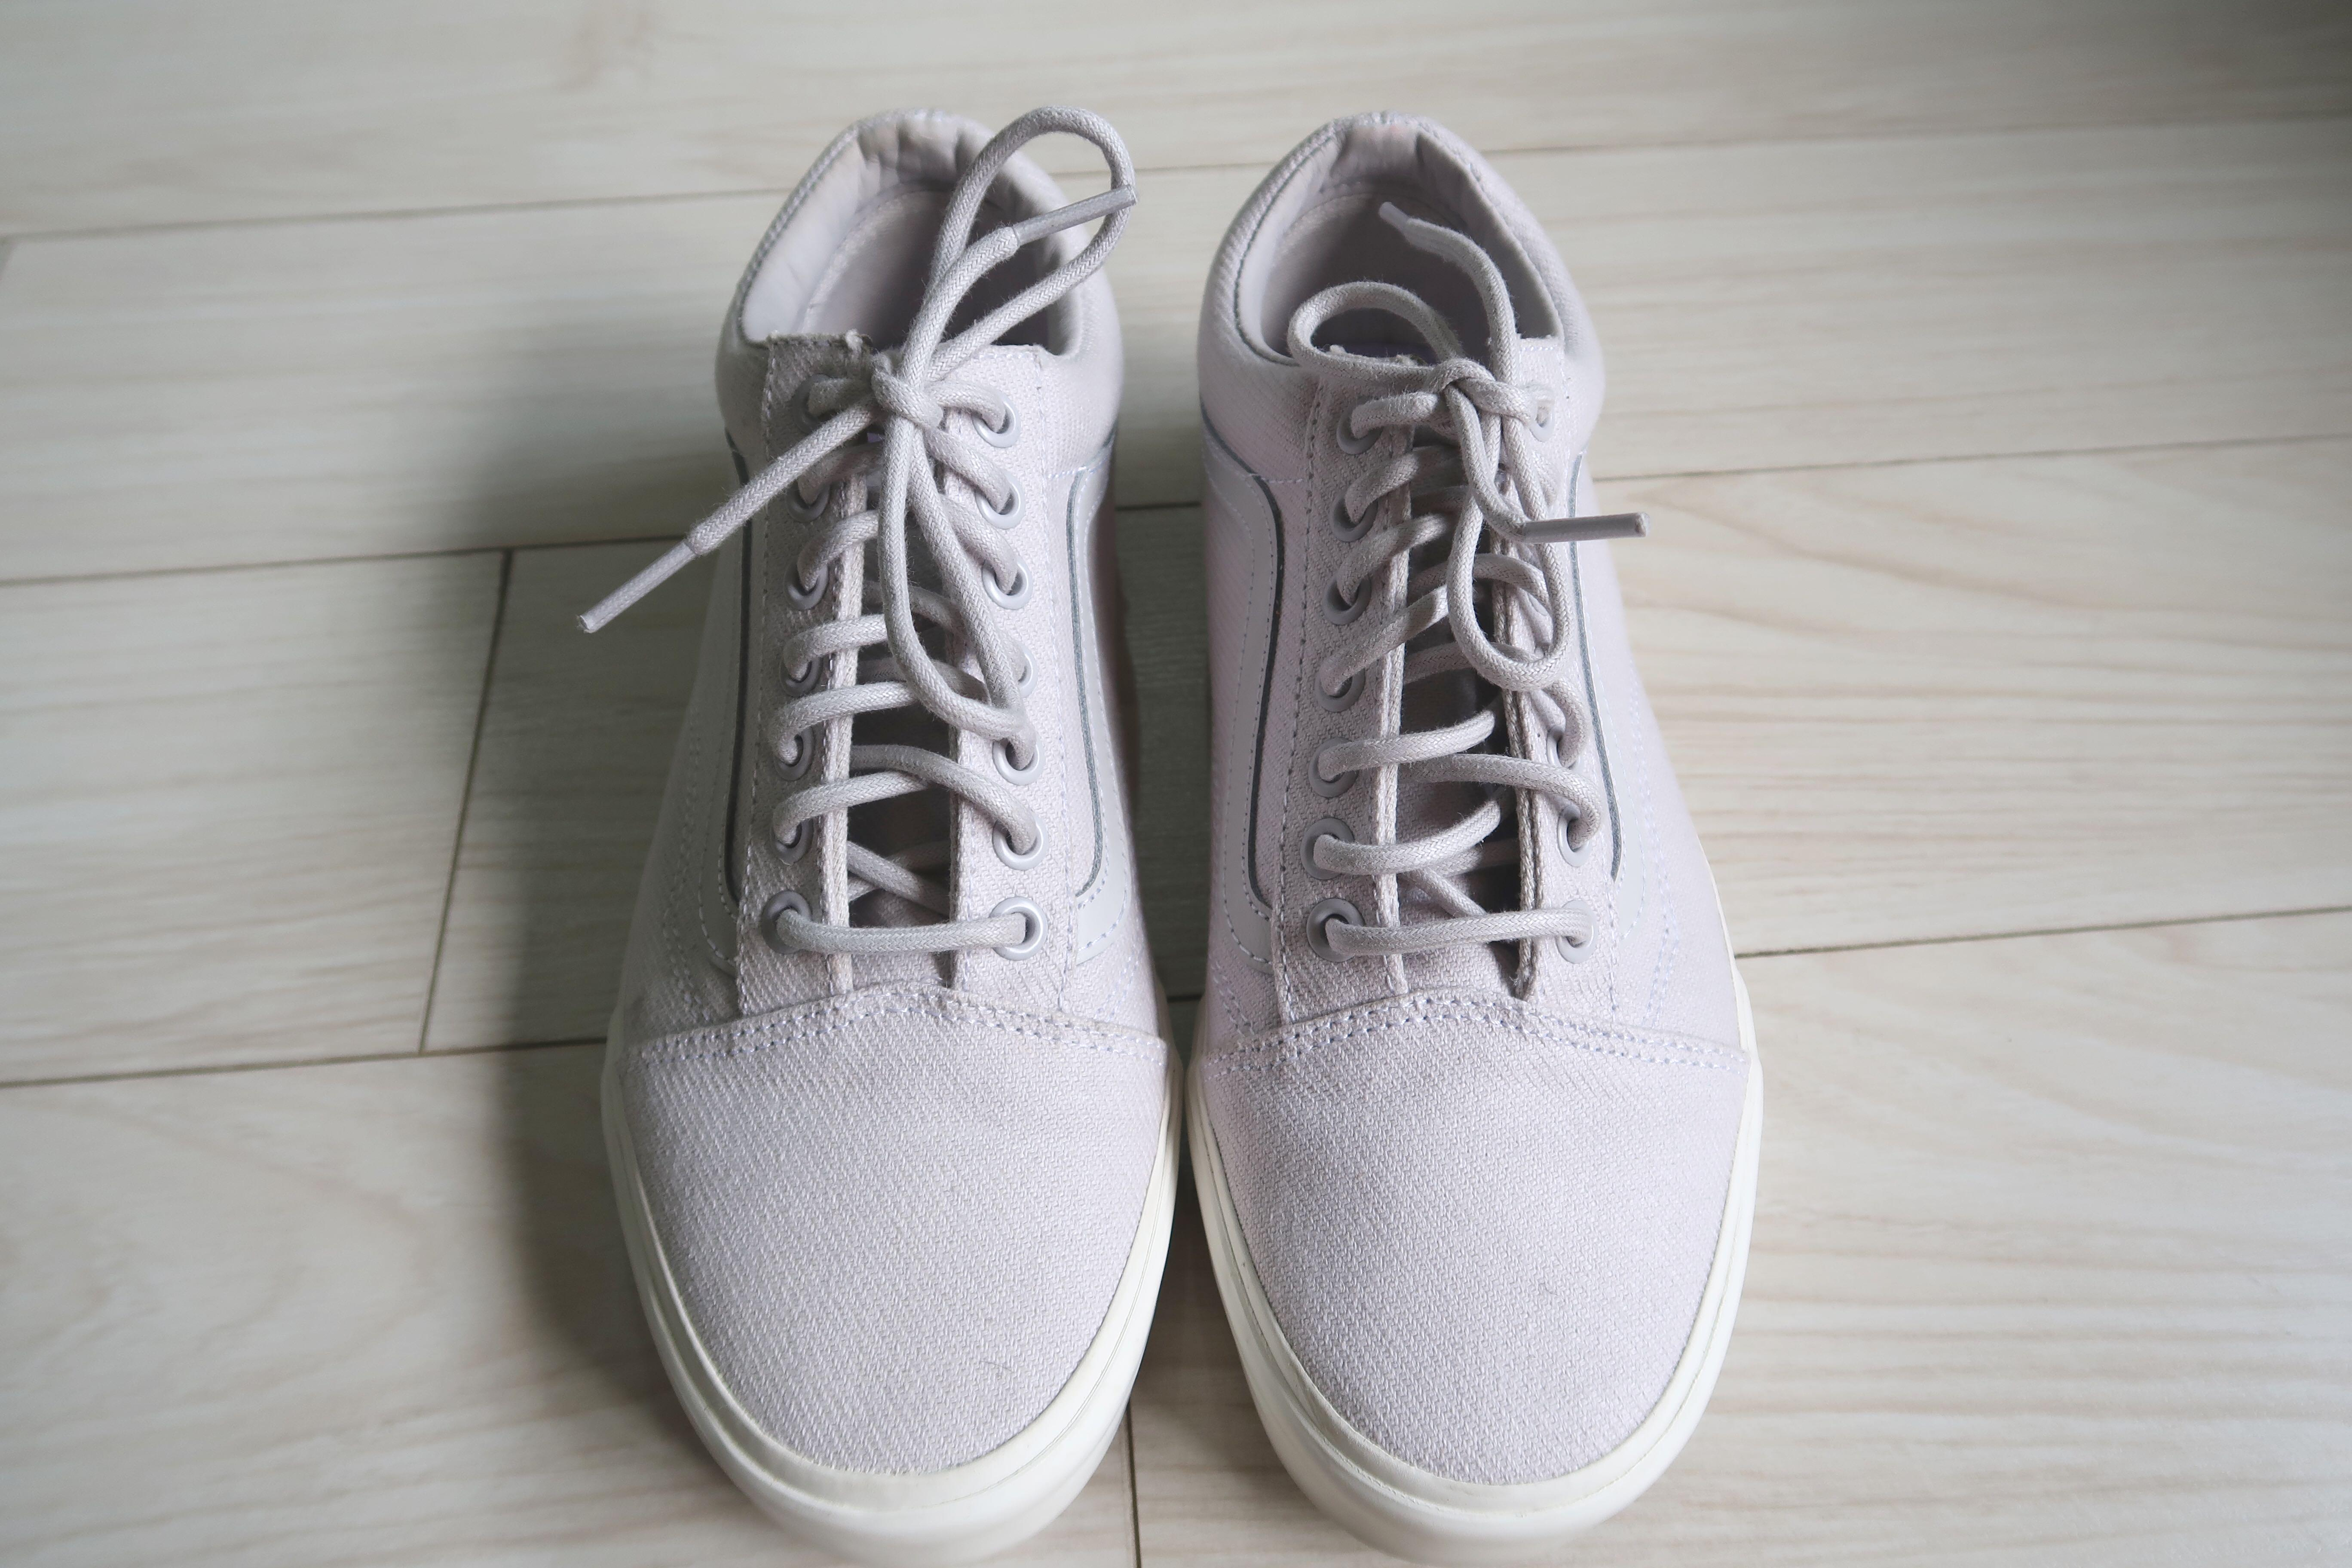 Vans Light Purple + White Sneakers